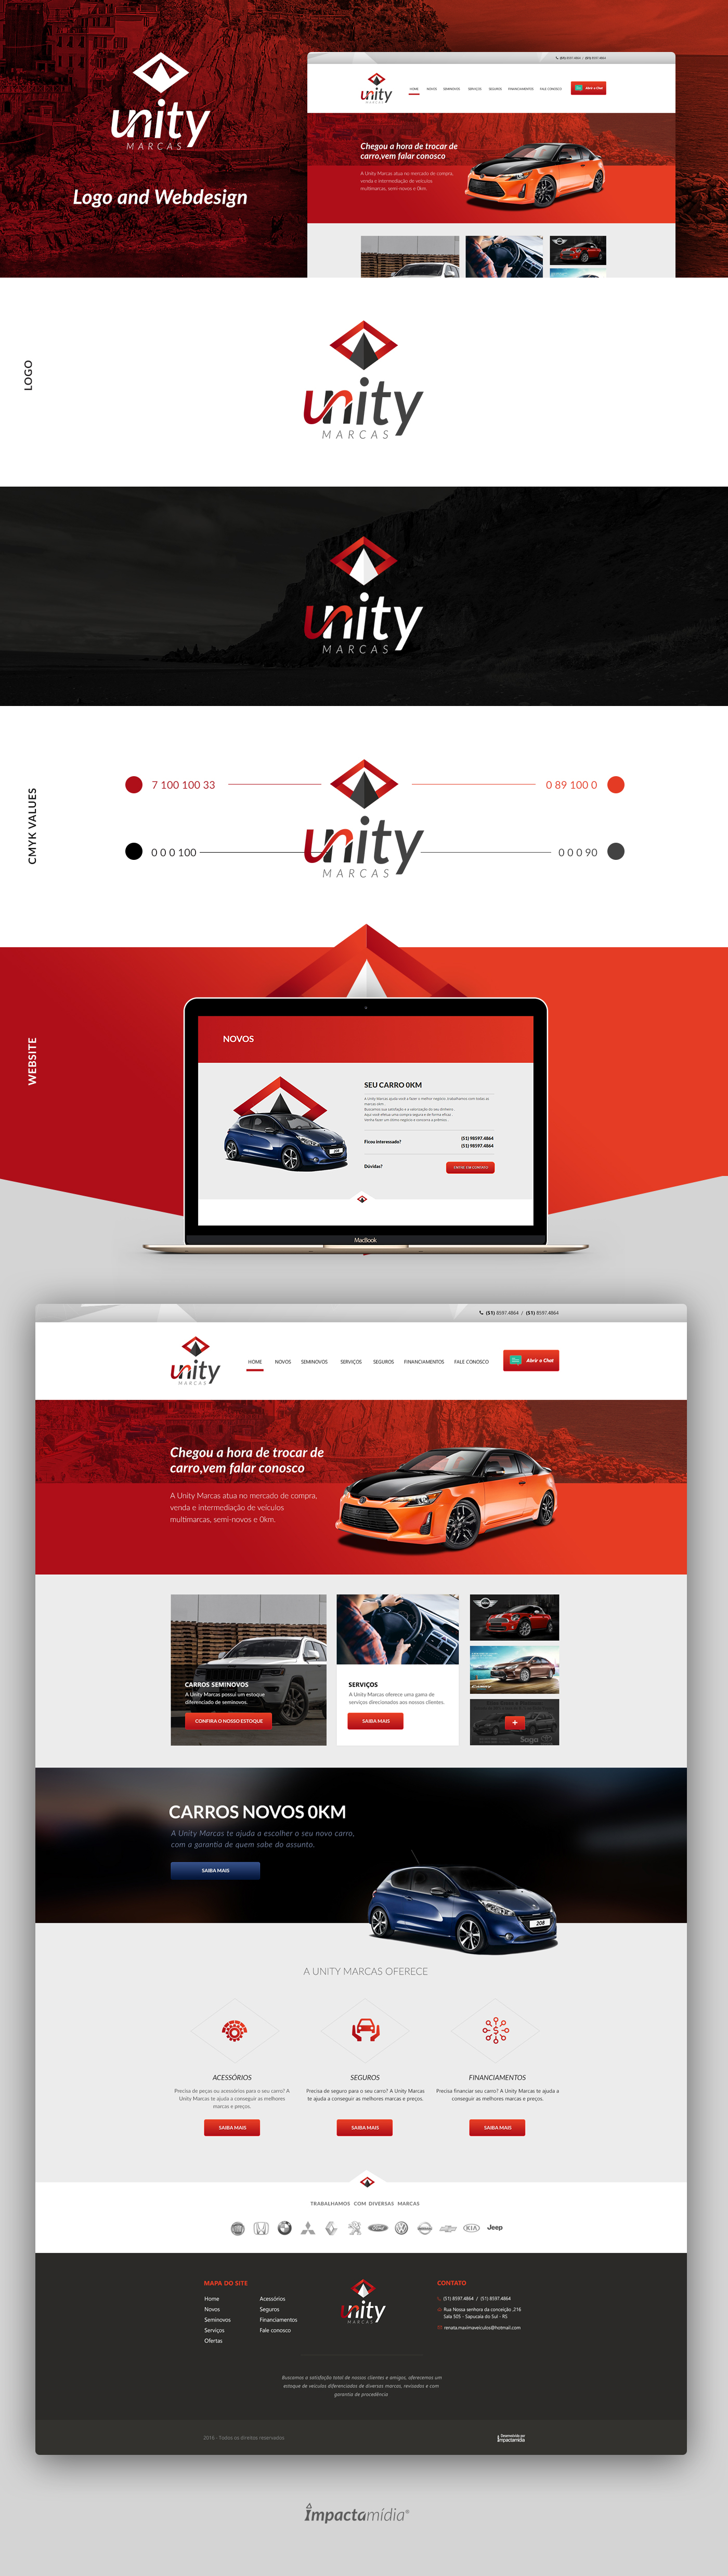 Webdesign orange Web Design  logo Logotype web site Web red gradient Cars